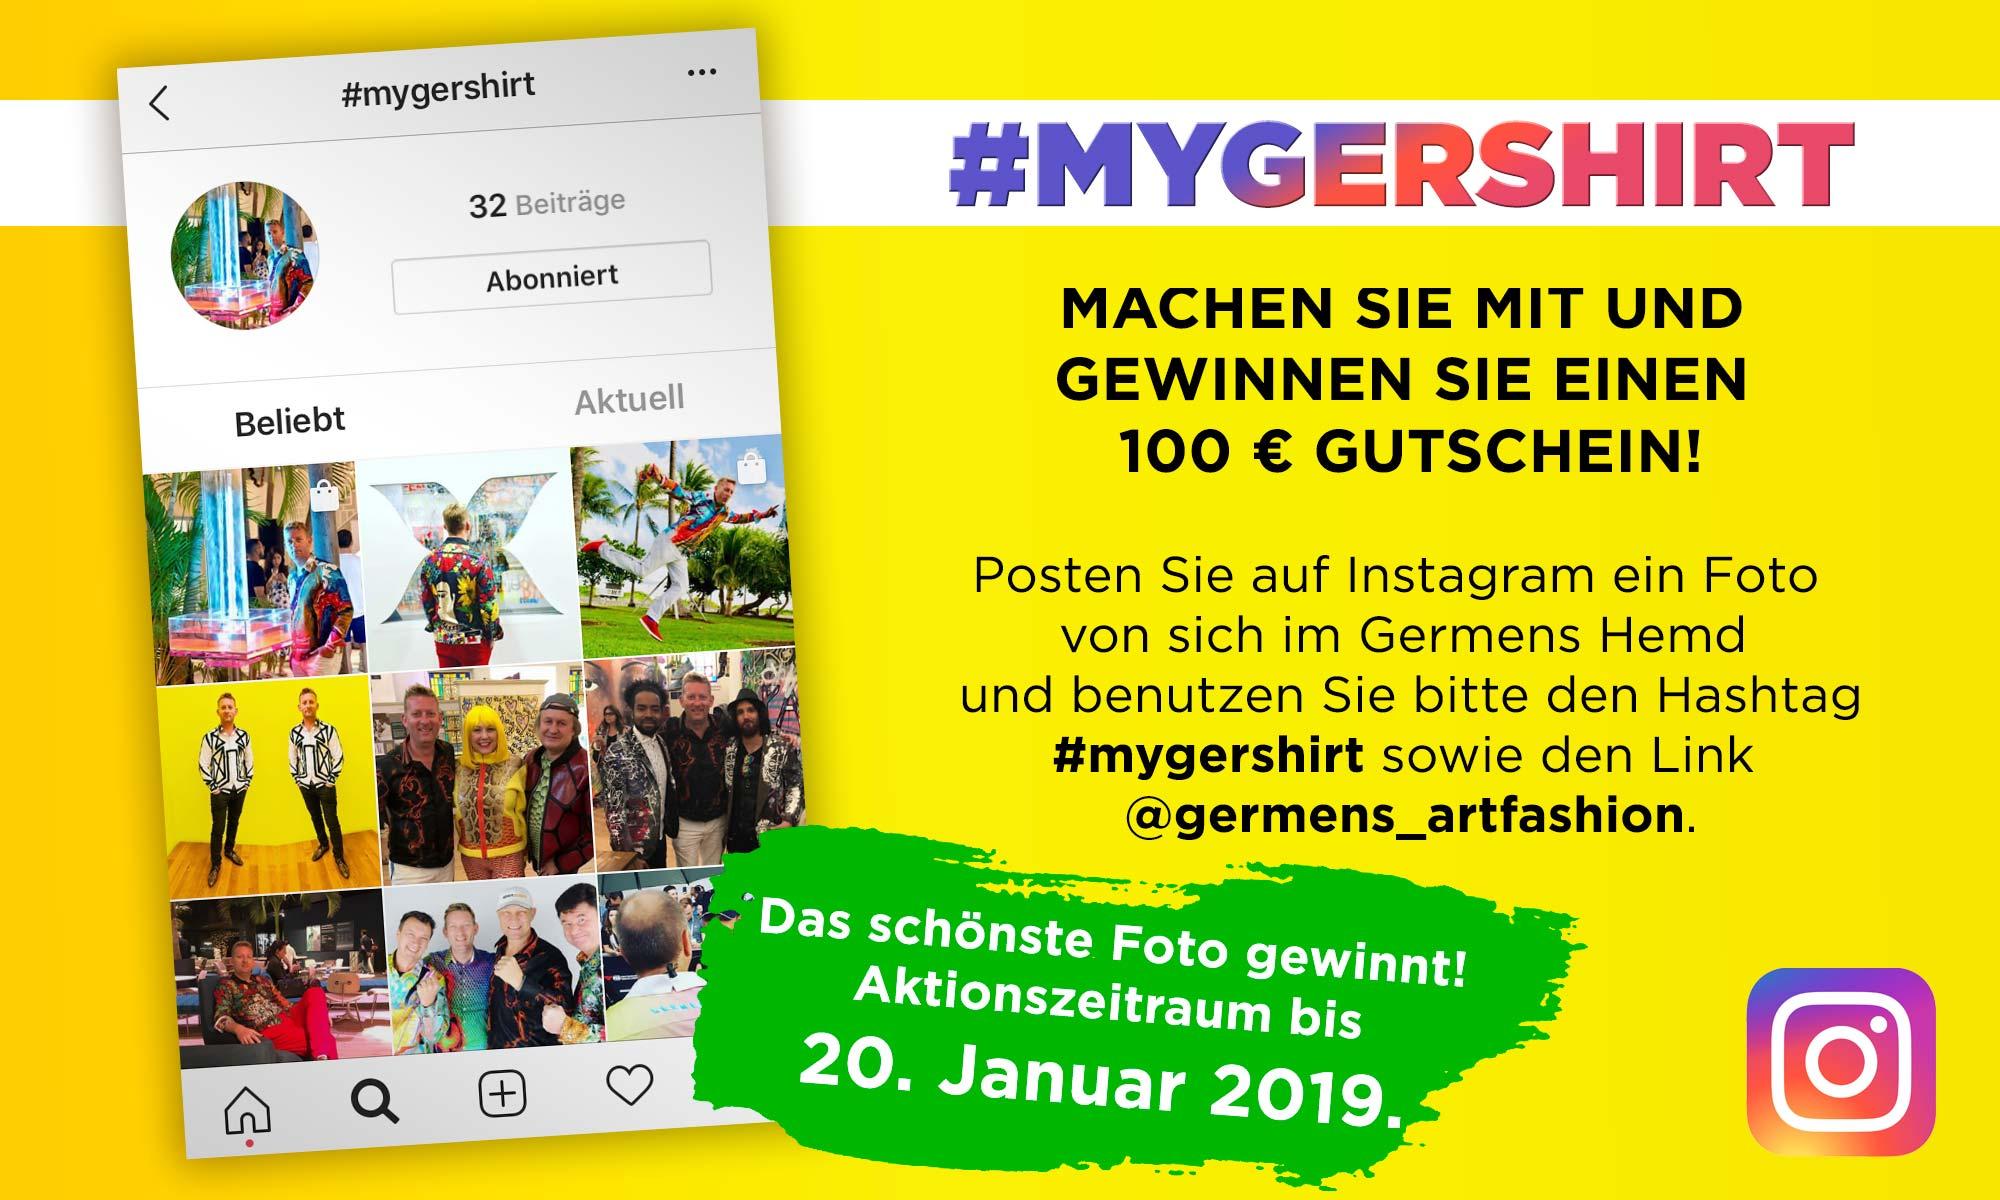 #mygershirt